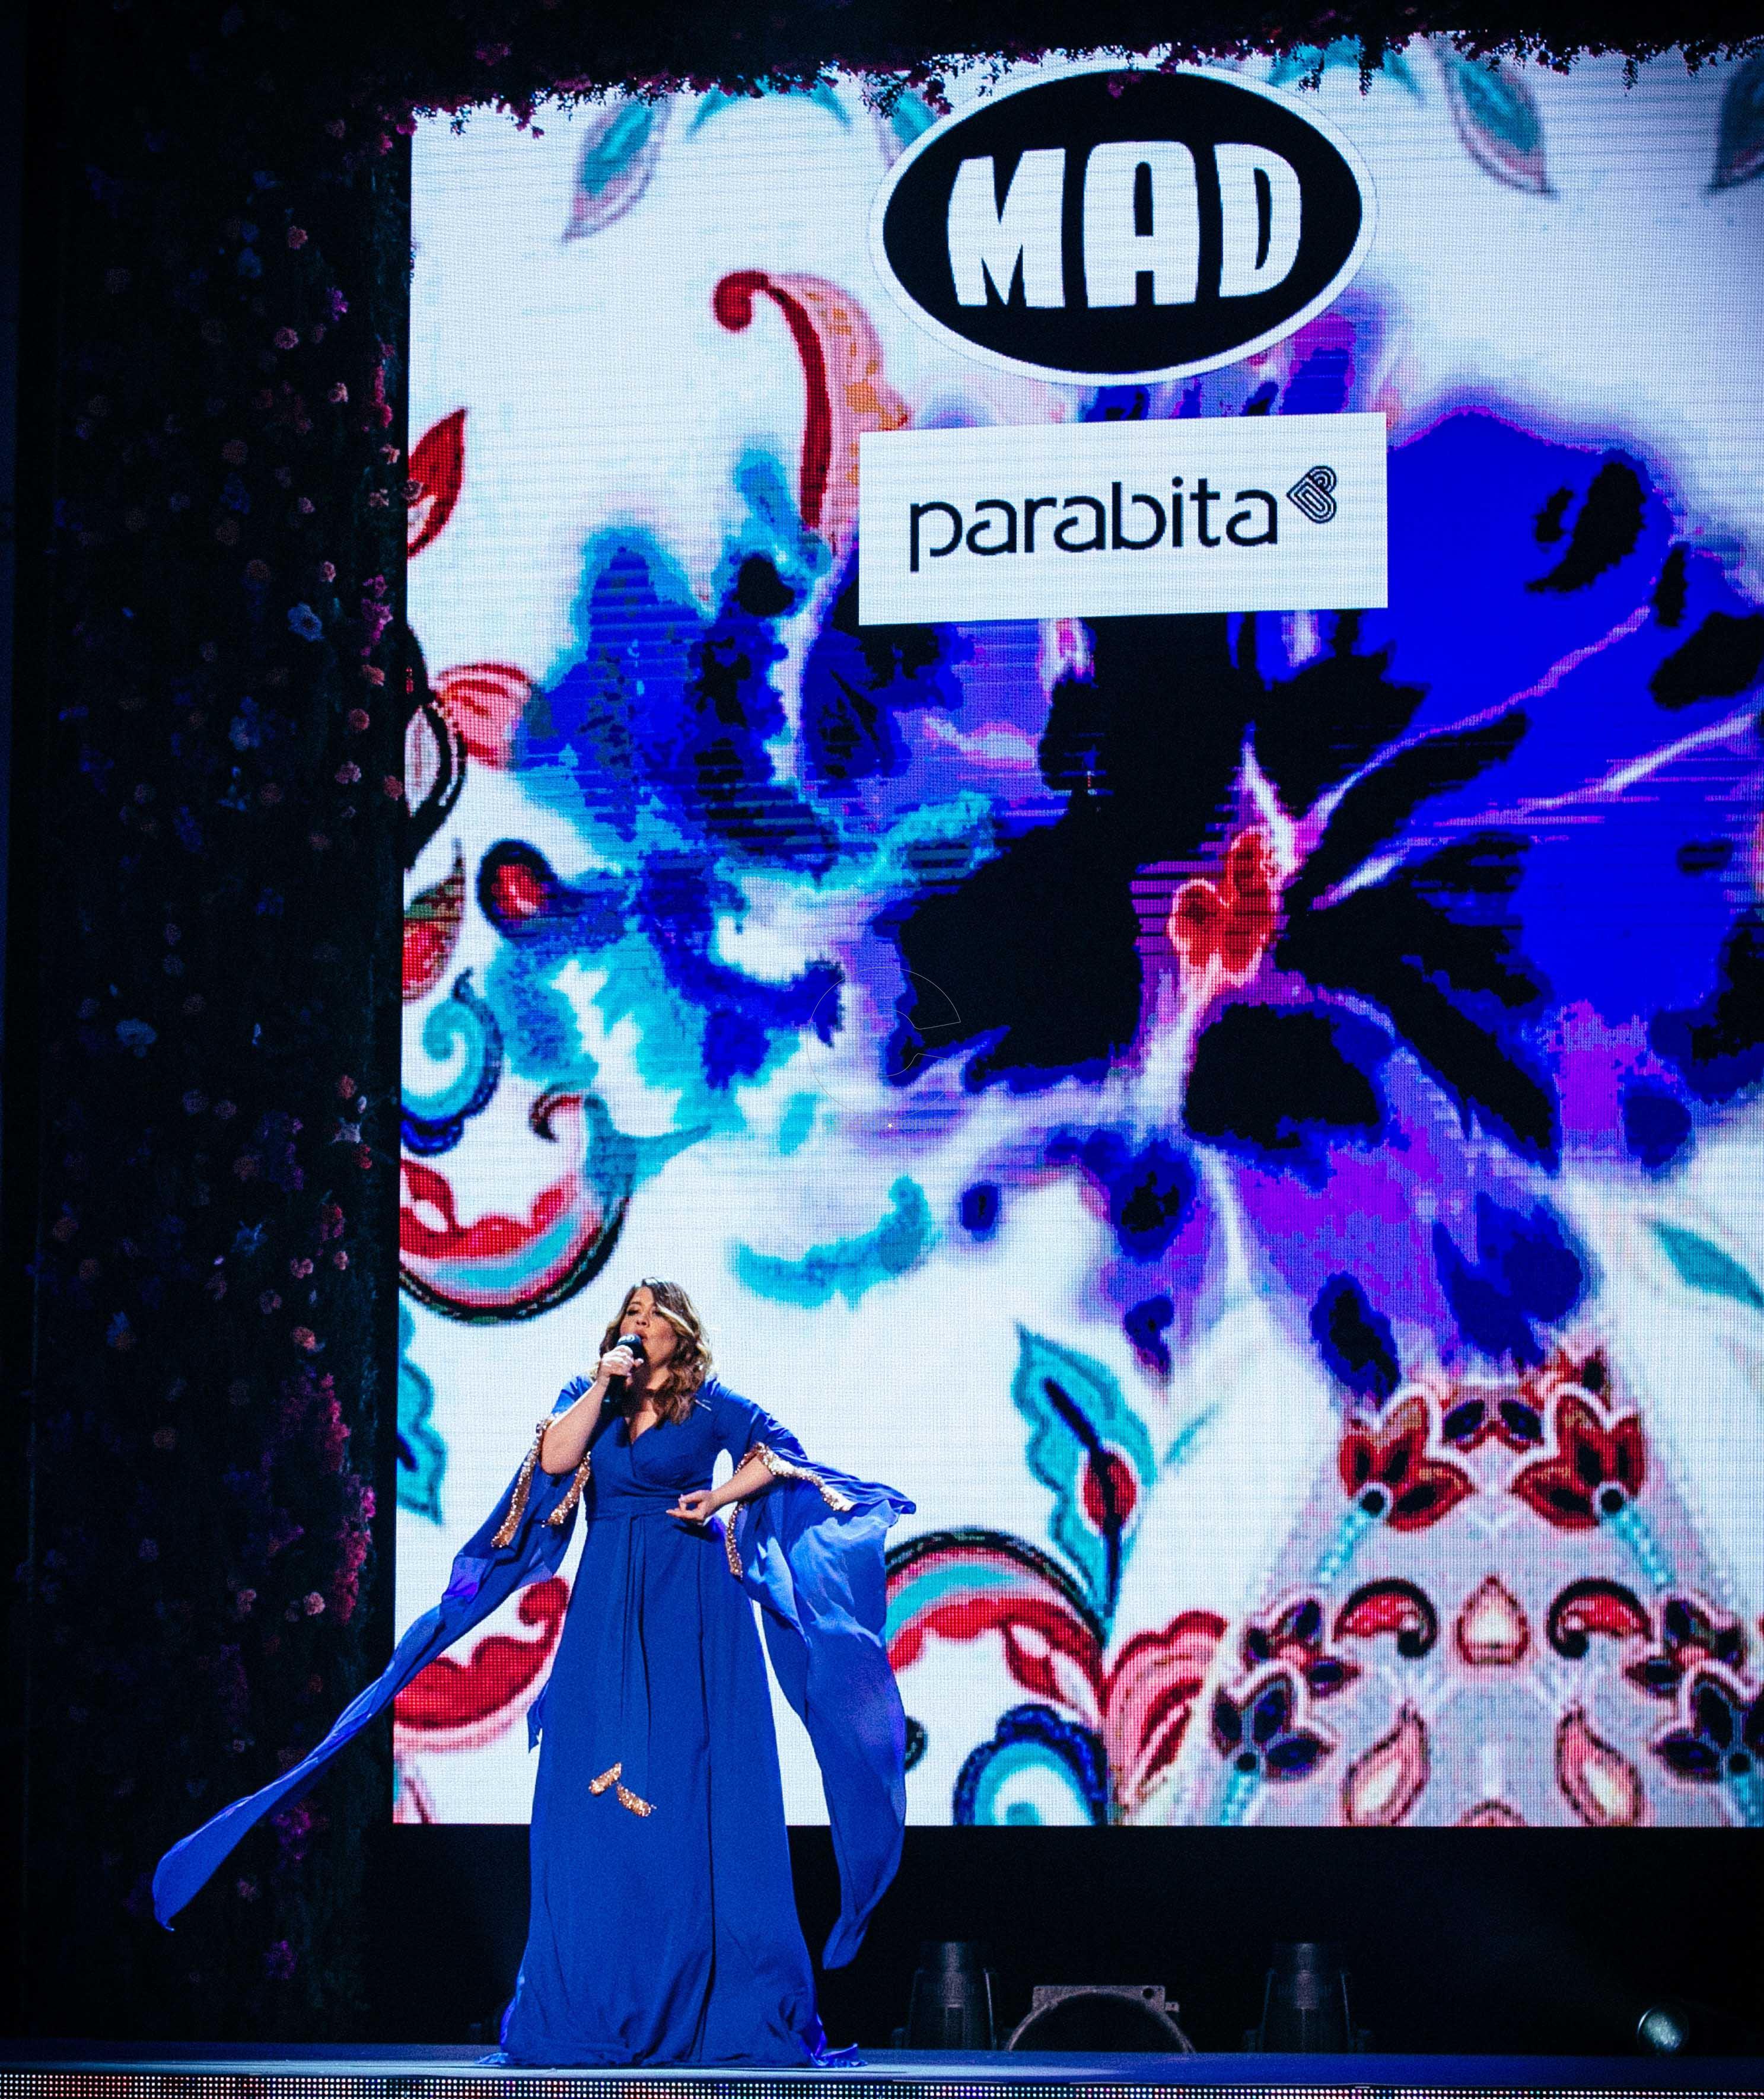 parabita__mariella_savides_on_stage_1